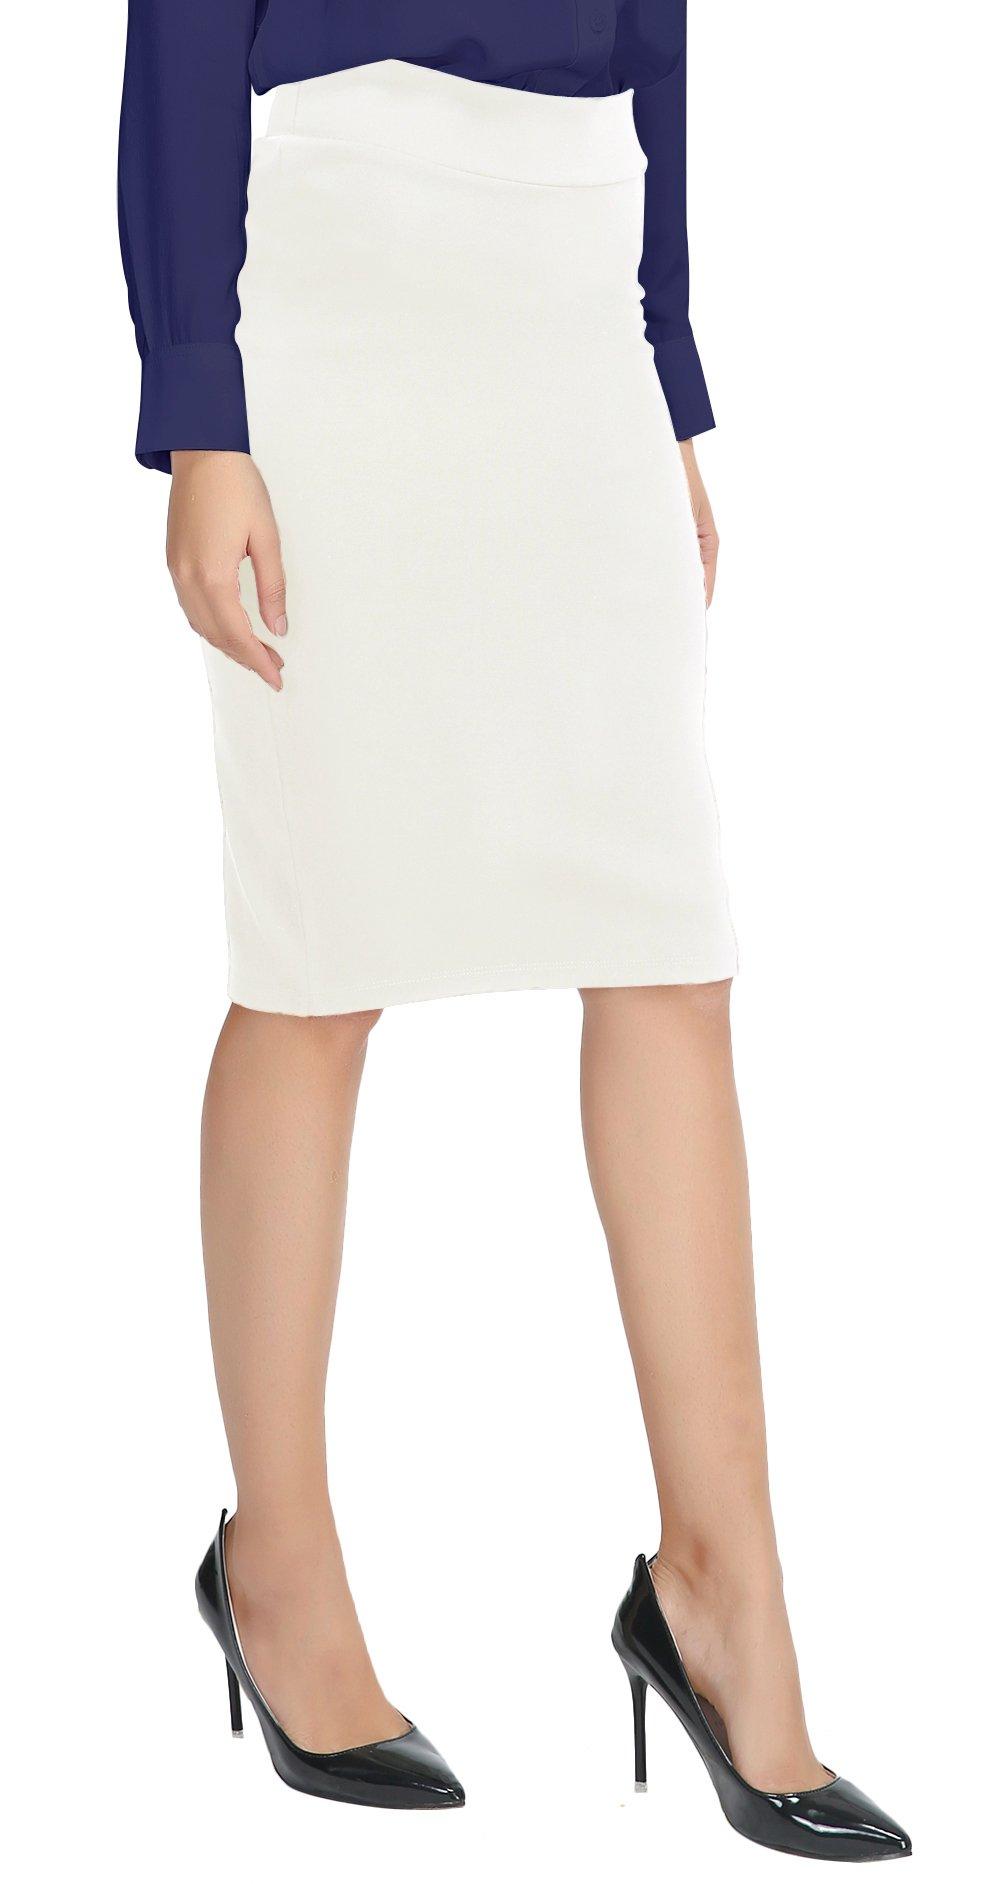 Urban CoCo Women's Elastic Waist Stretch Bodycon Midi Pencil Skirt (S, White)